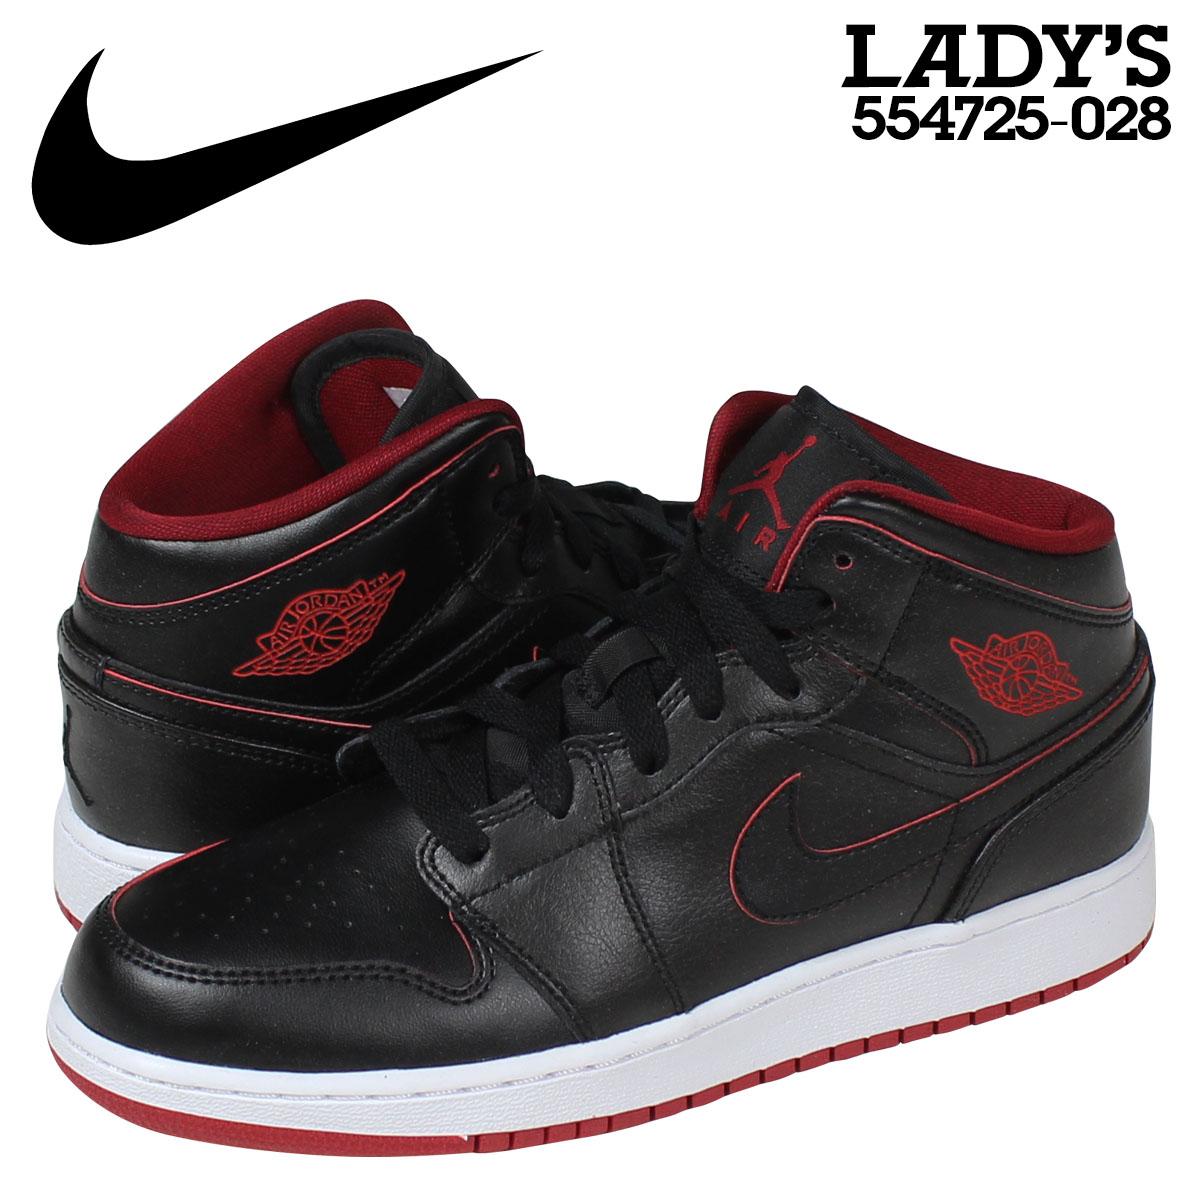 a24566b8ae8 Whats up Sports: NIKE Nike Air Jordan sneakers Womens AIR JORDAN 1 MID BG  Air Jordan 1 mid 554725 - 028 shoes black   Rakuten Global Market